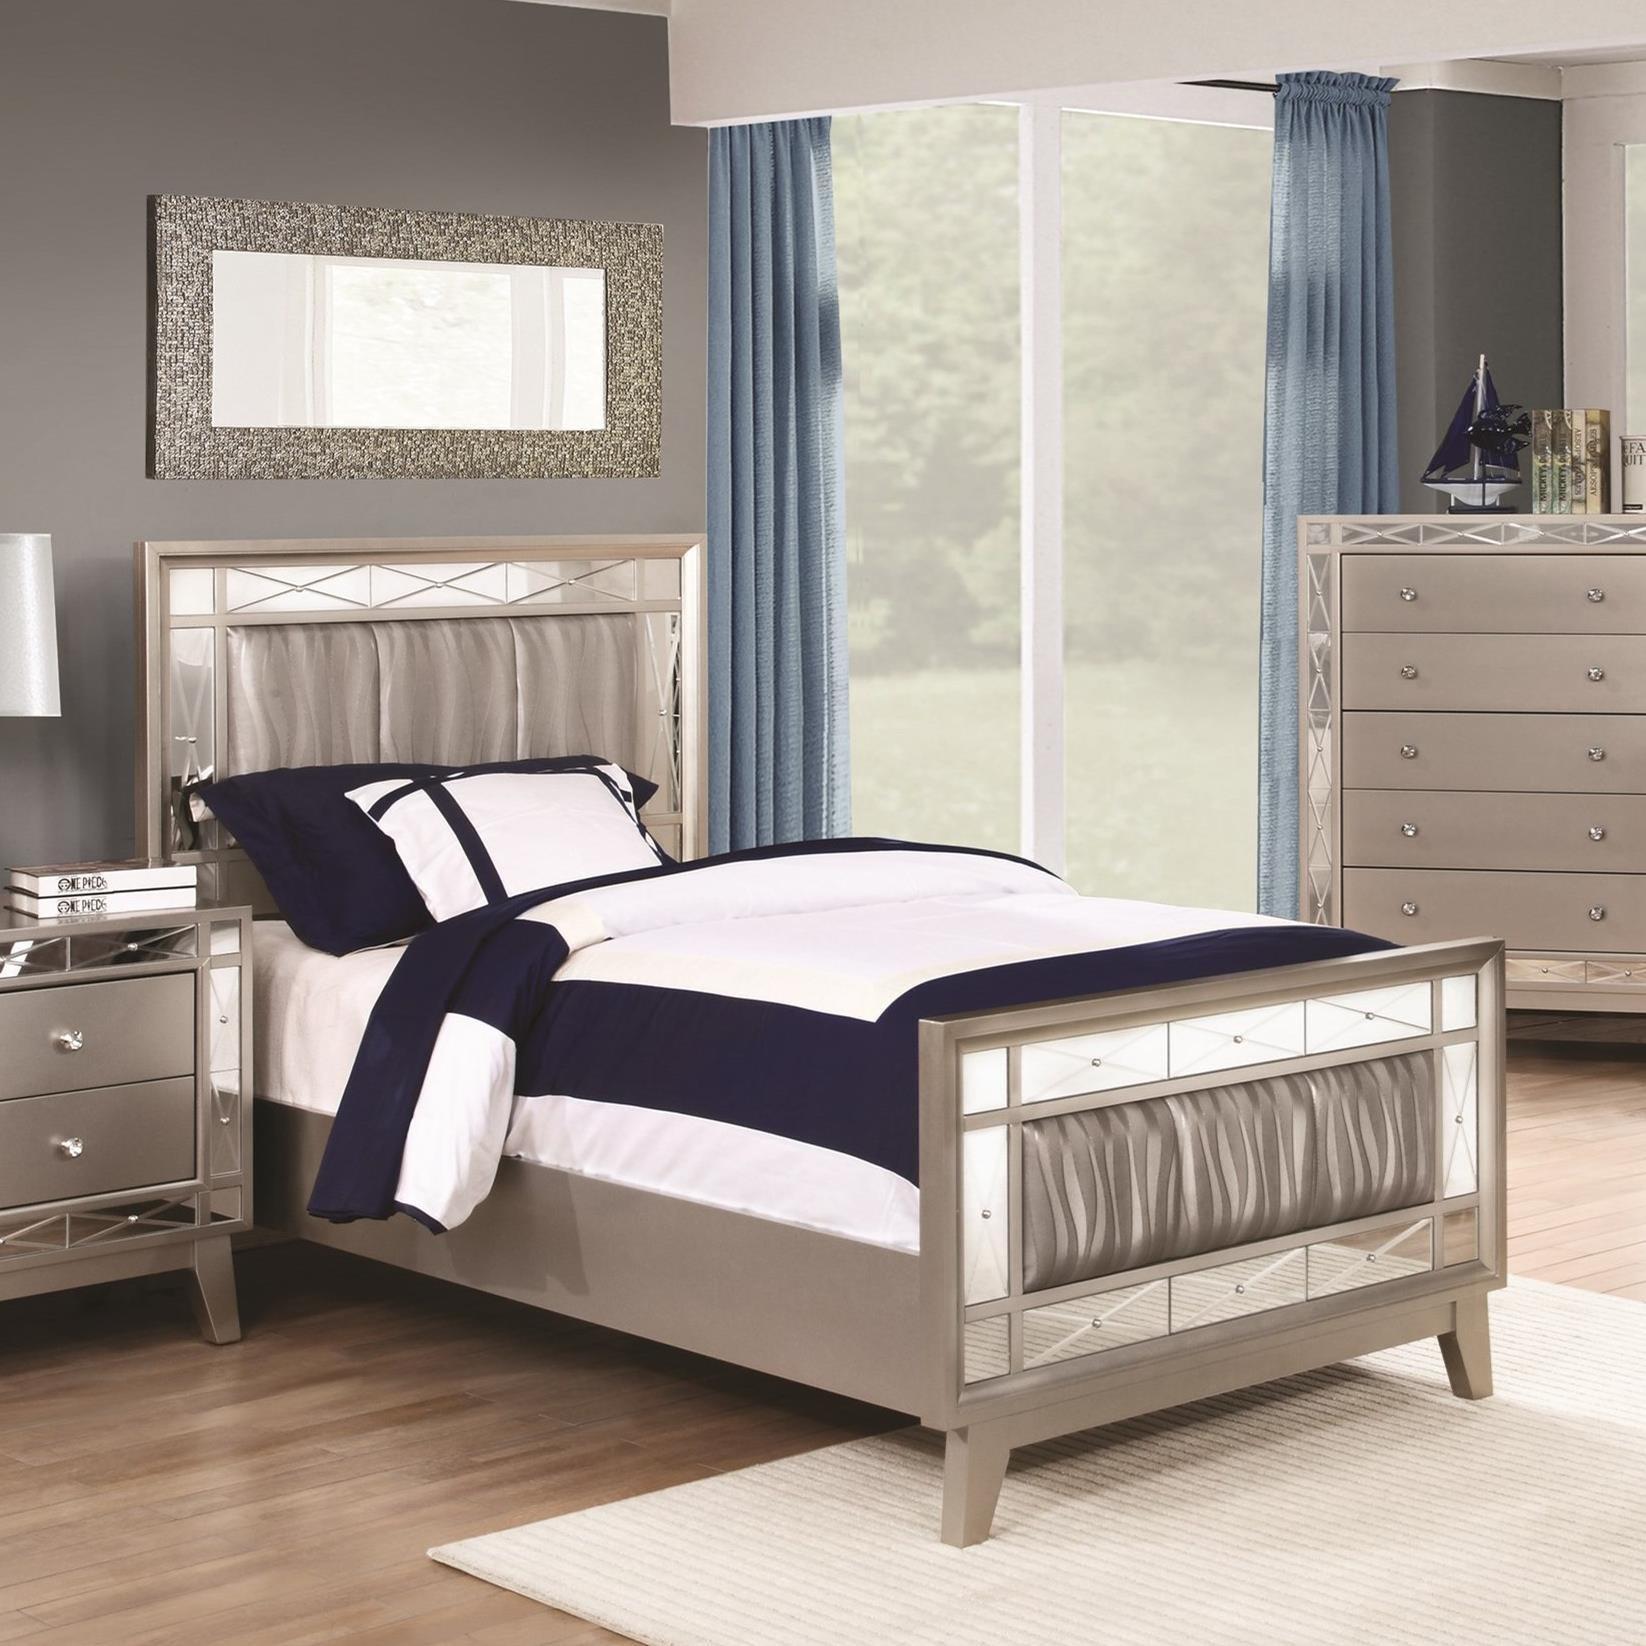 coaster leighton twin bed nassau furniture panel beds